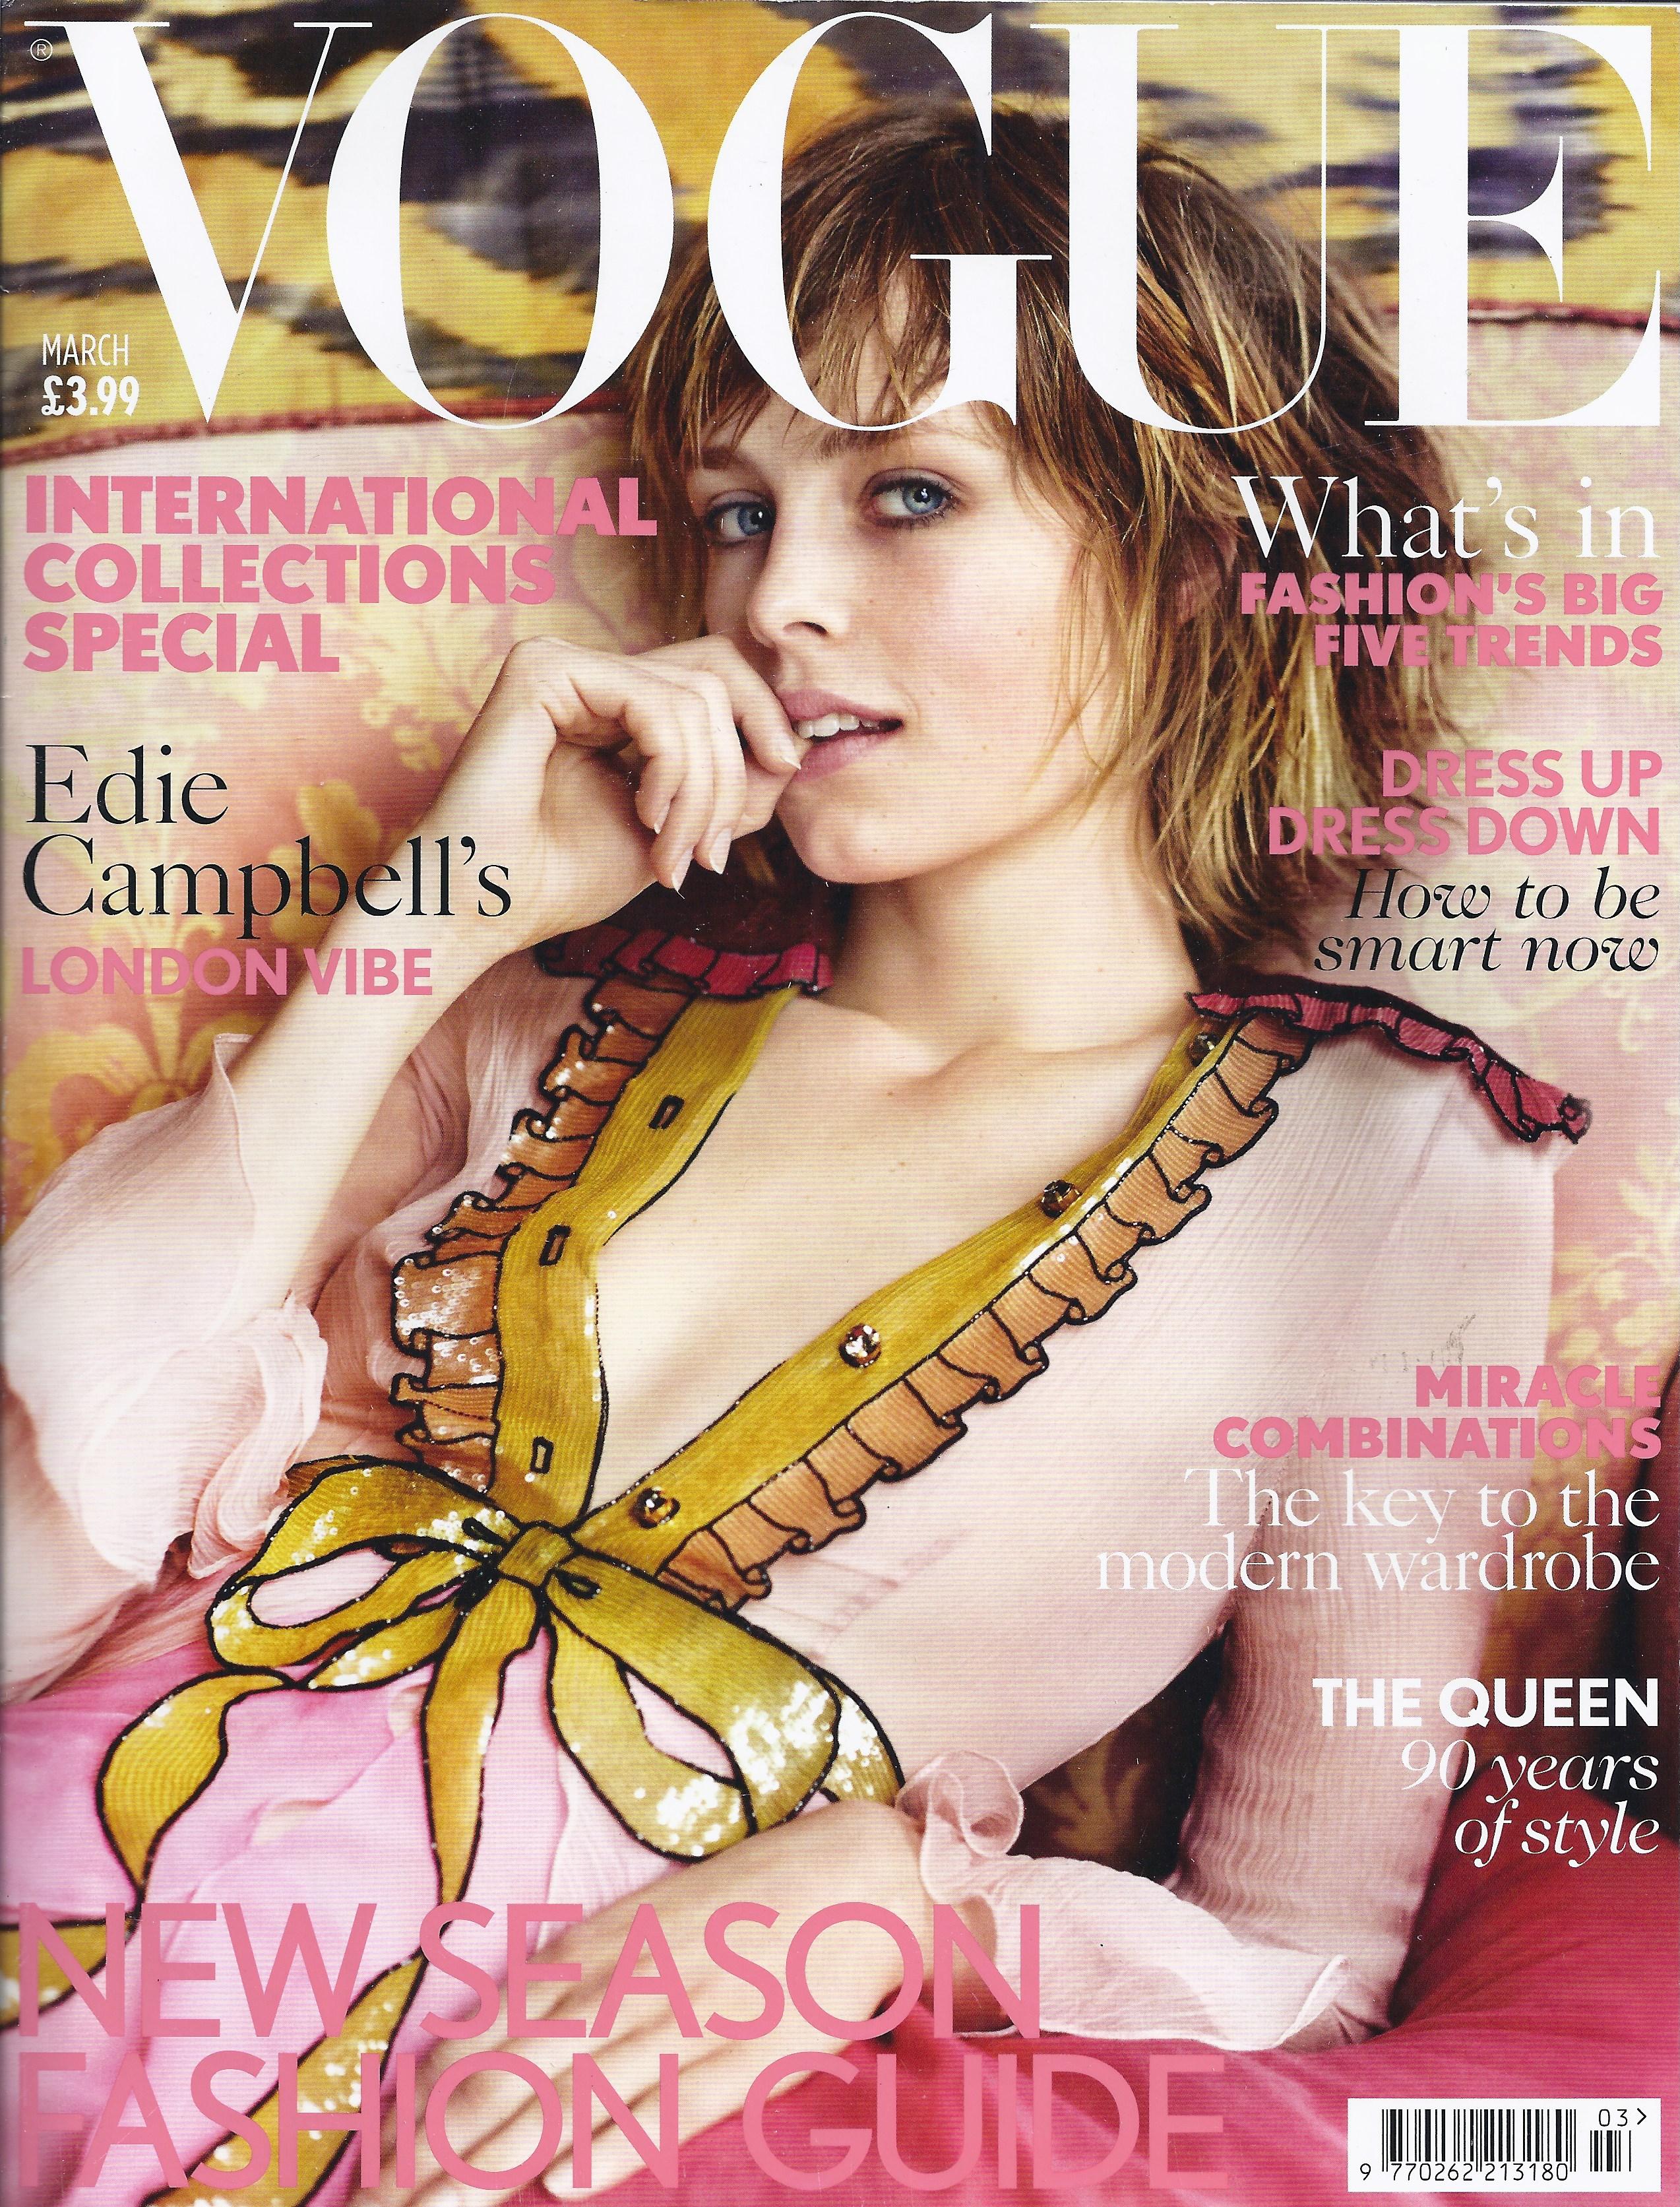 Vogue March 2016